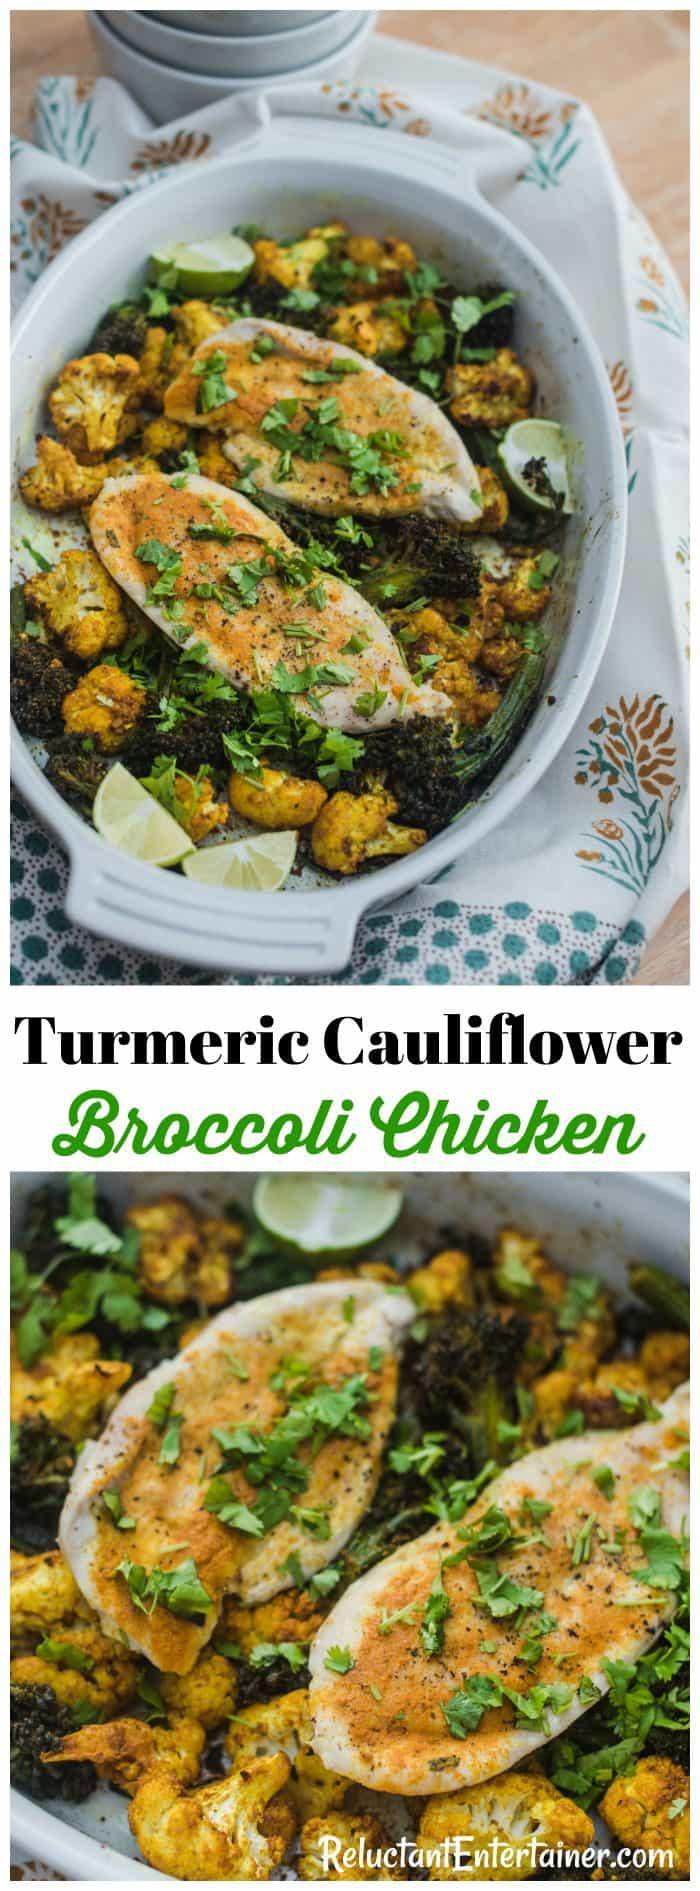 Turmeric Cauliflower Broccoli Chicken